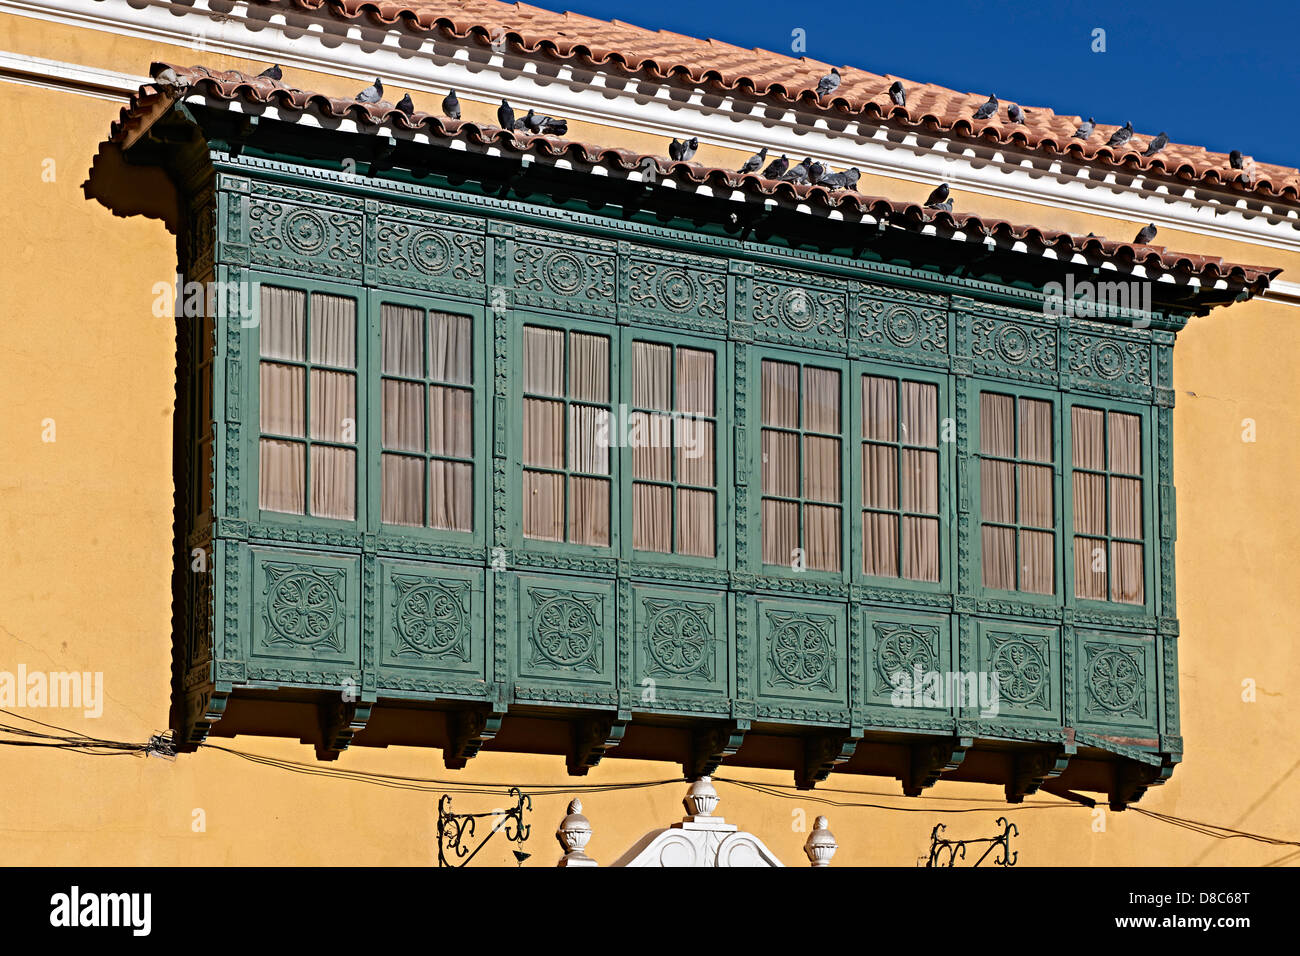 Window of town hall in Potosi, Bolivia - Stock Image